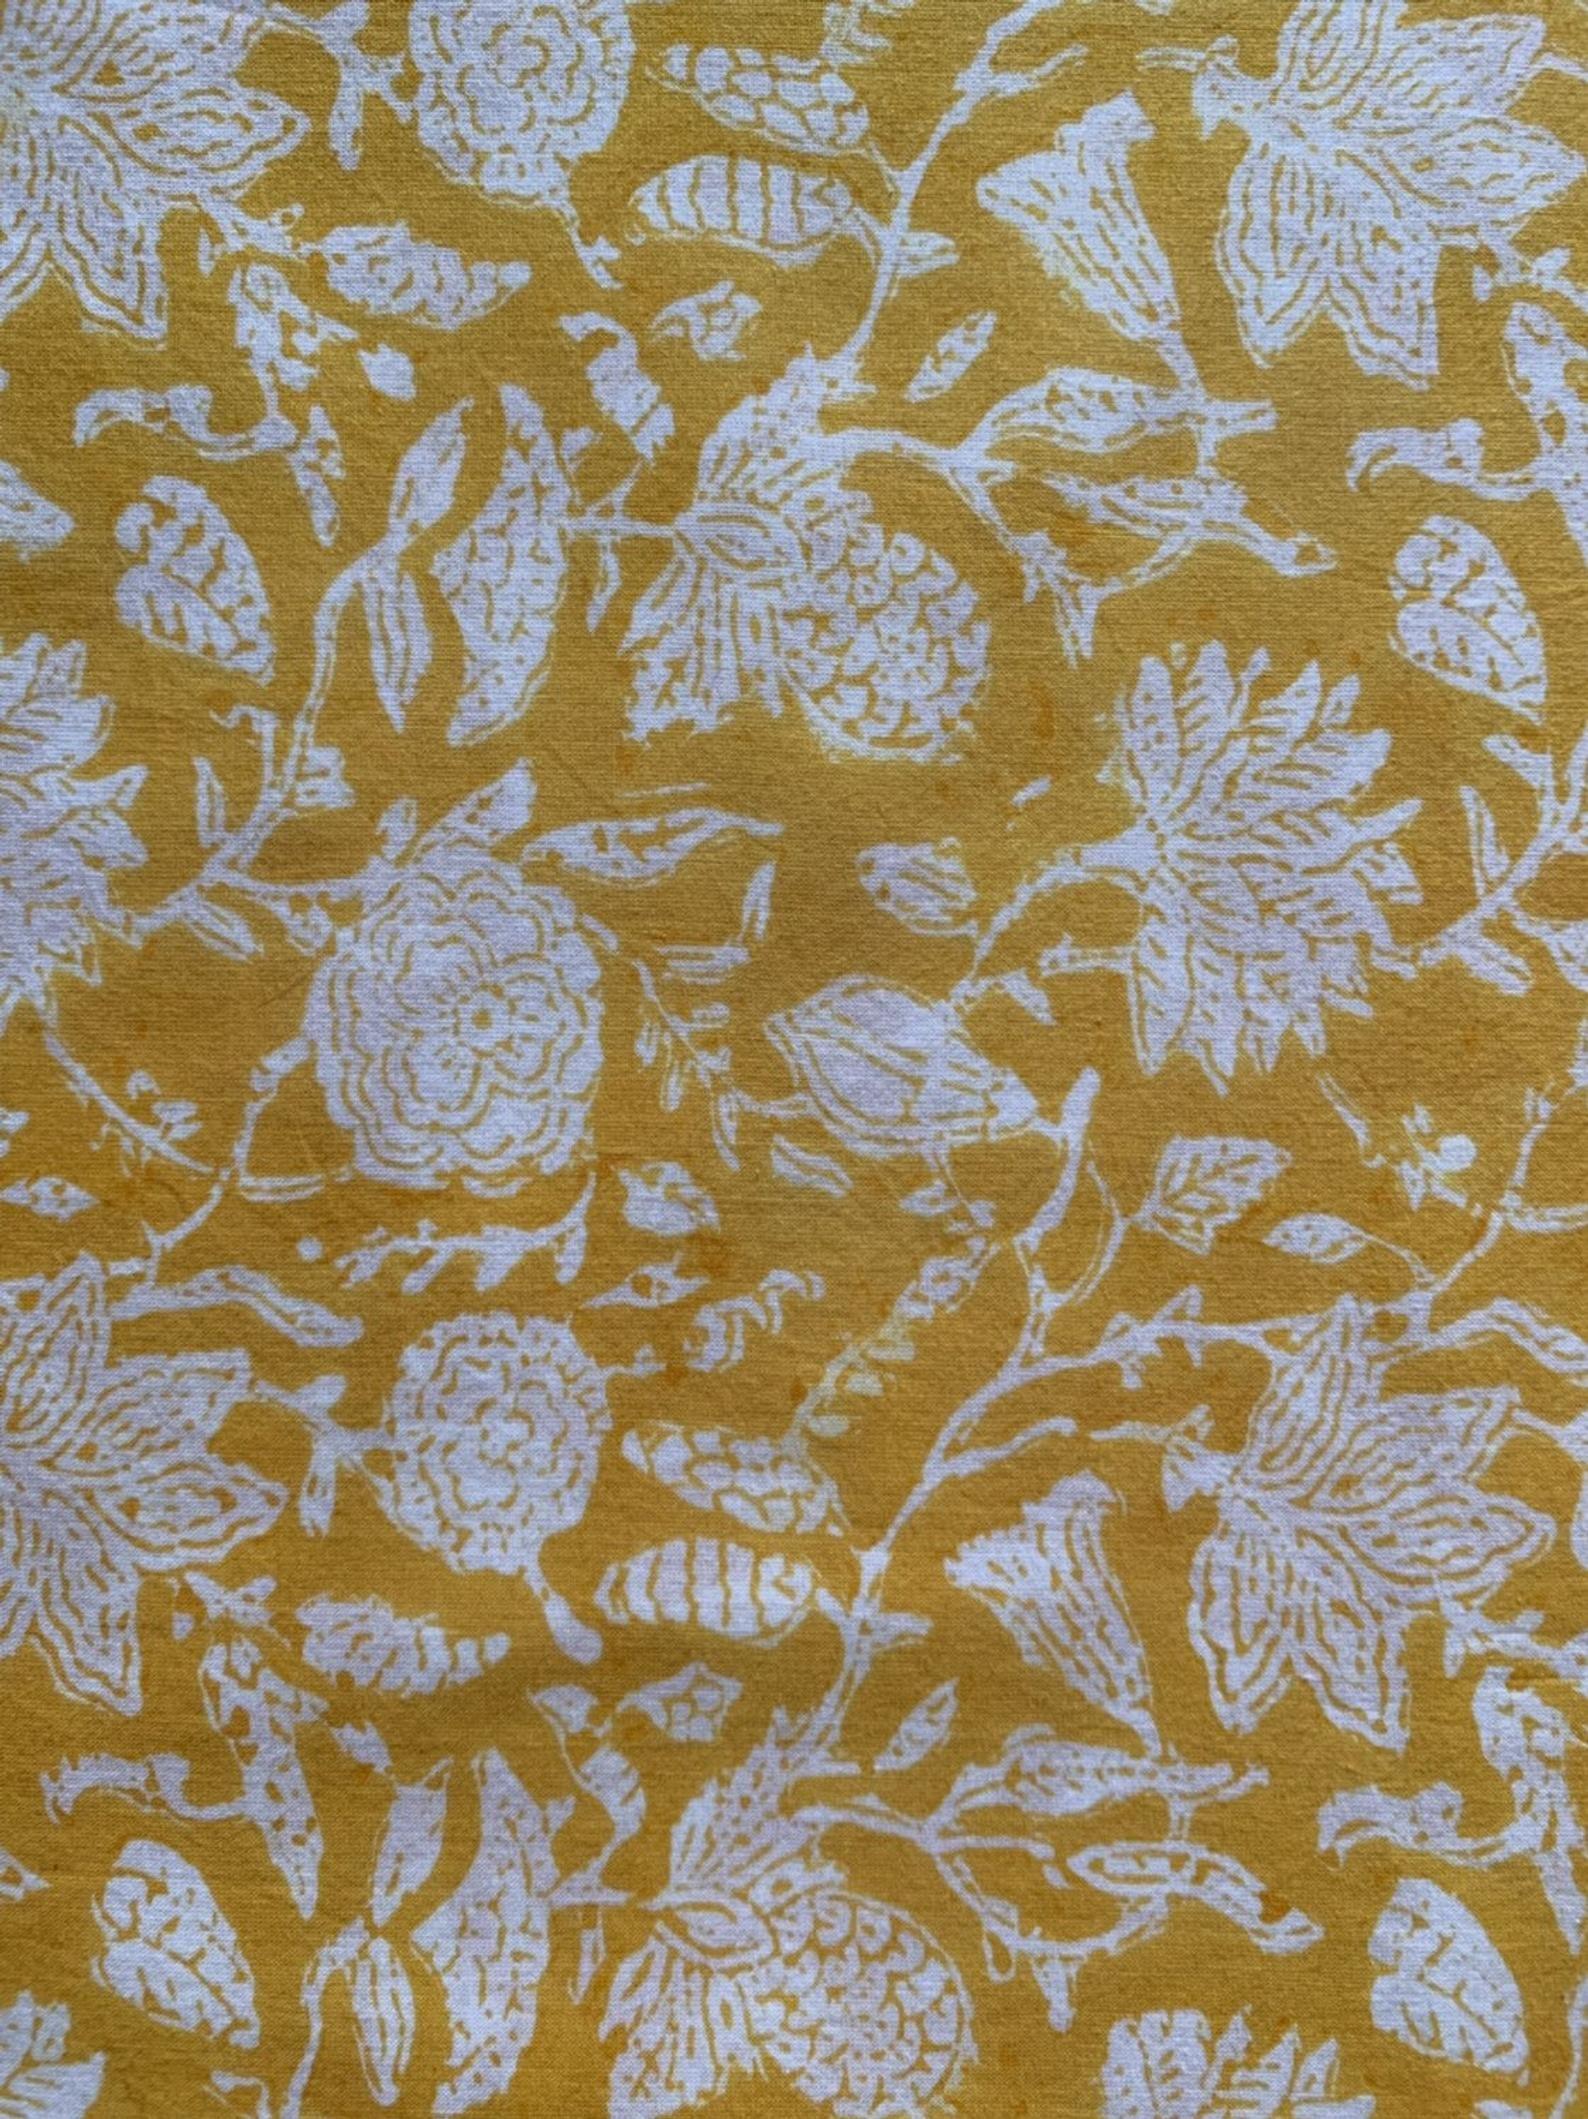 Floral Print Cotton Fabric Block Print Fabric Modern Floral Fabric